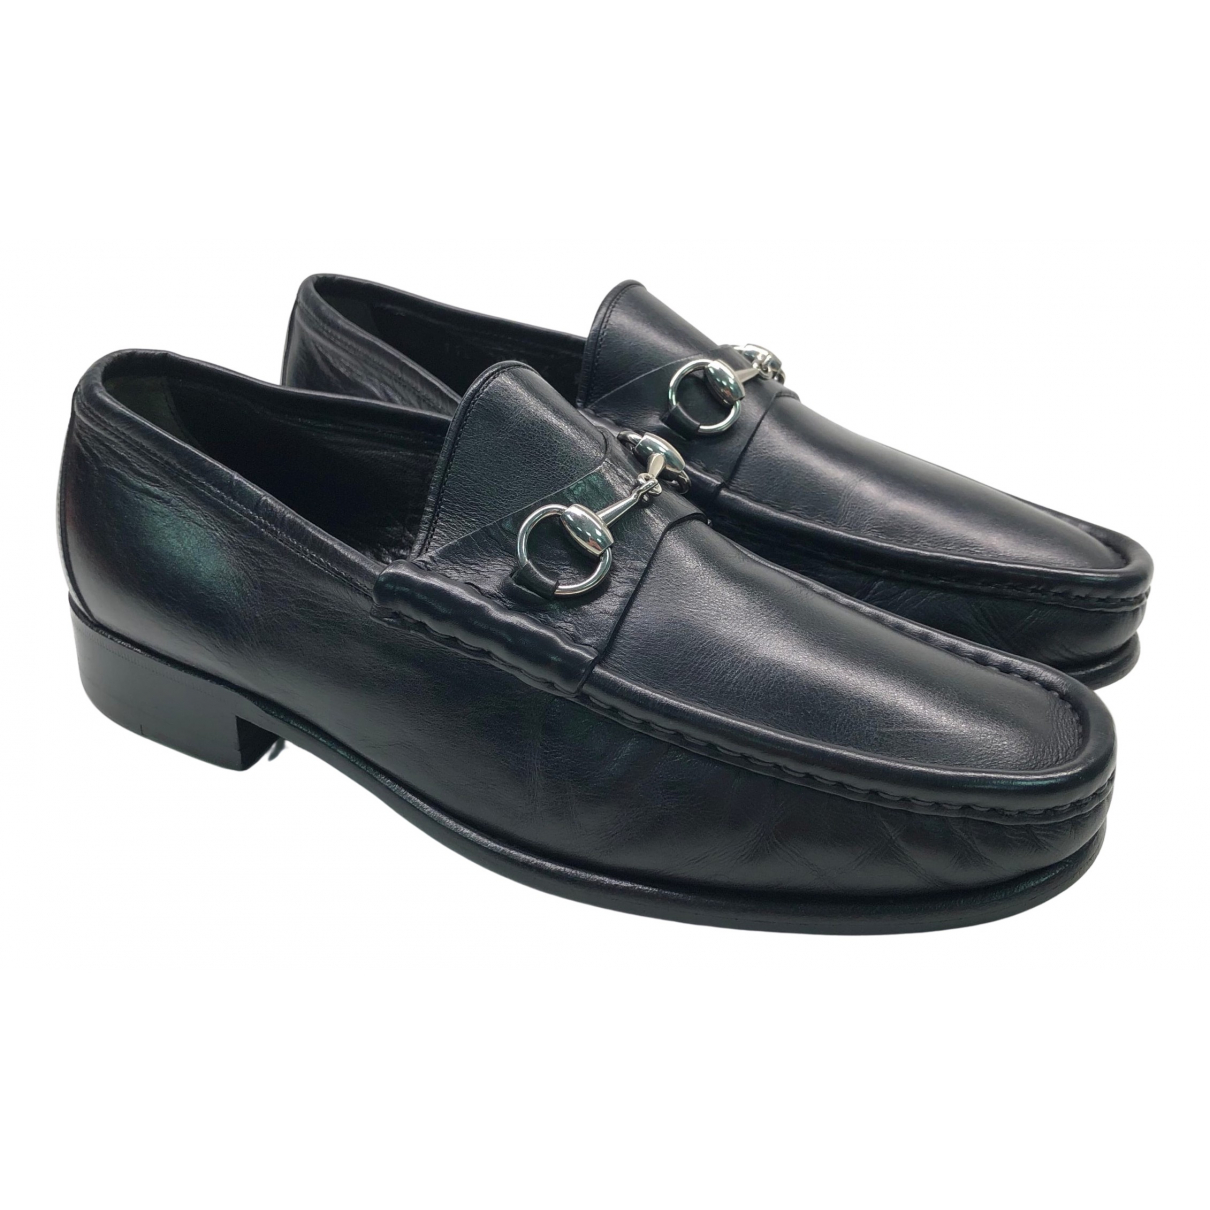 Gucci N Black Leather Flats for Men 44 EU